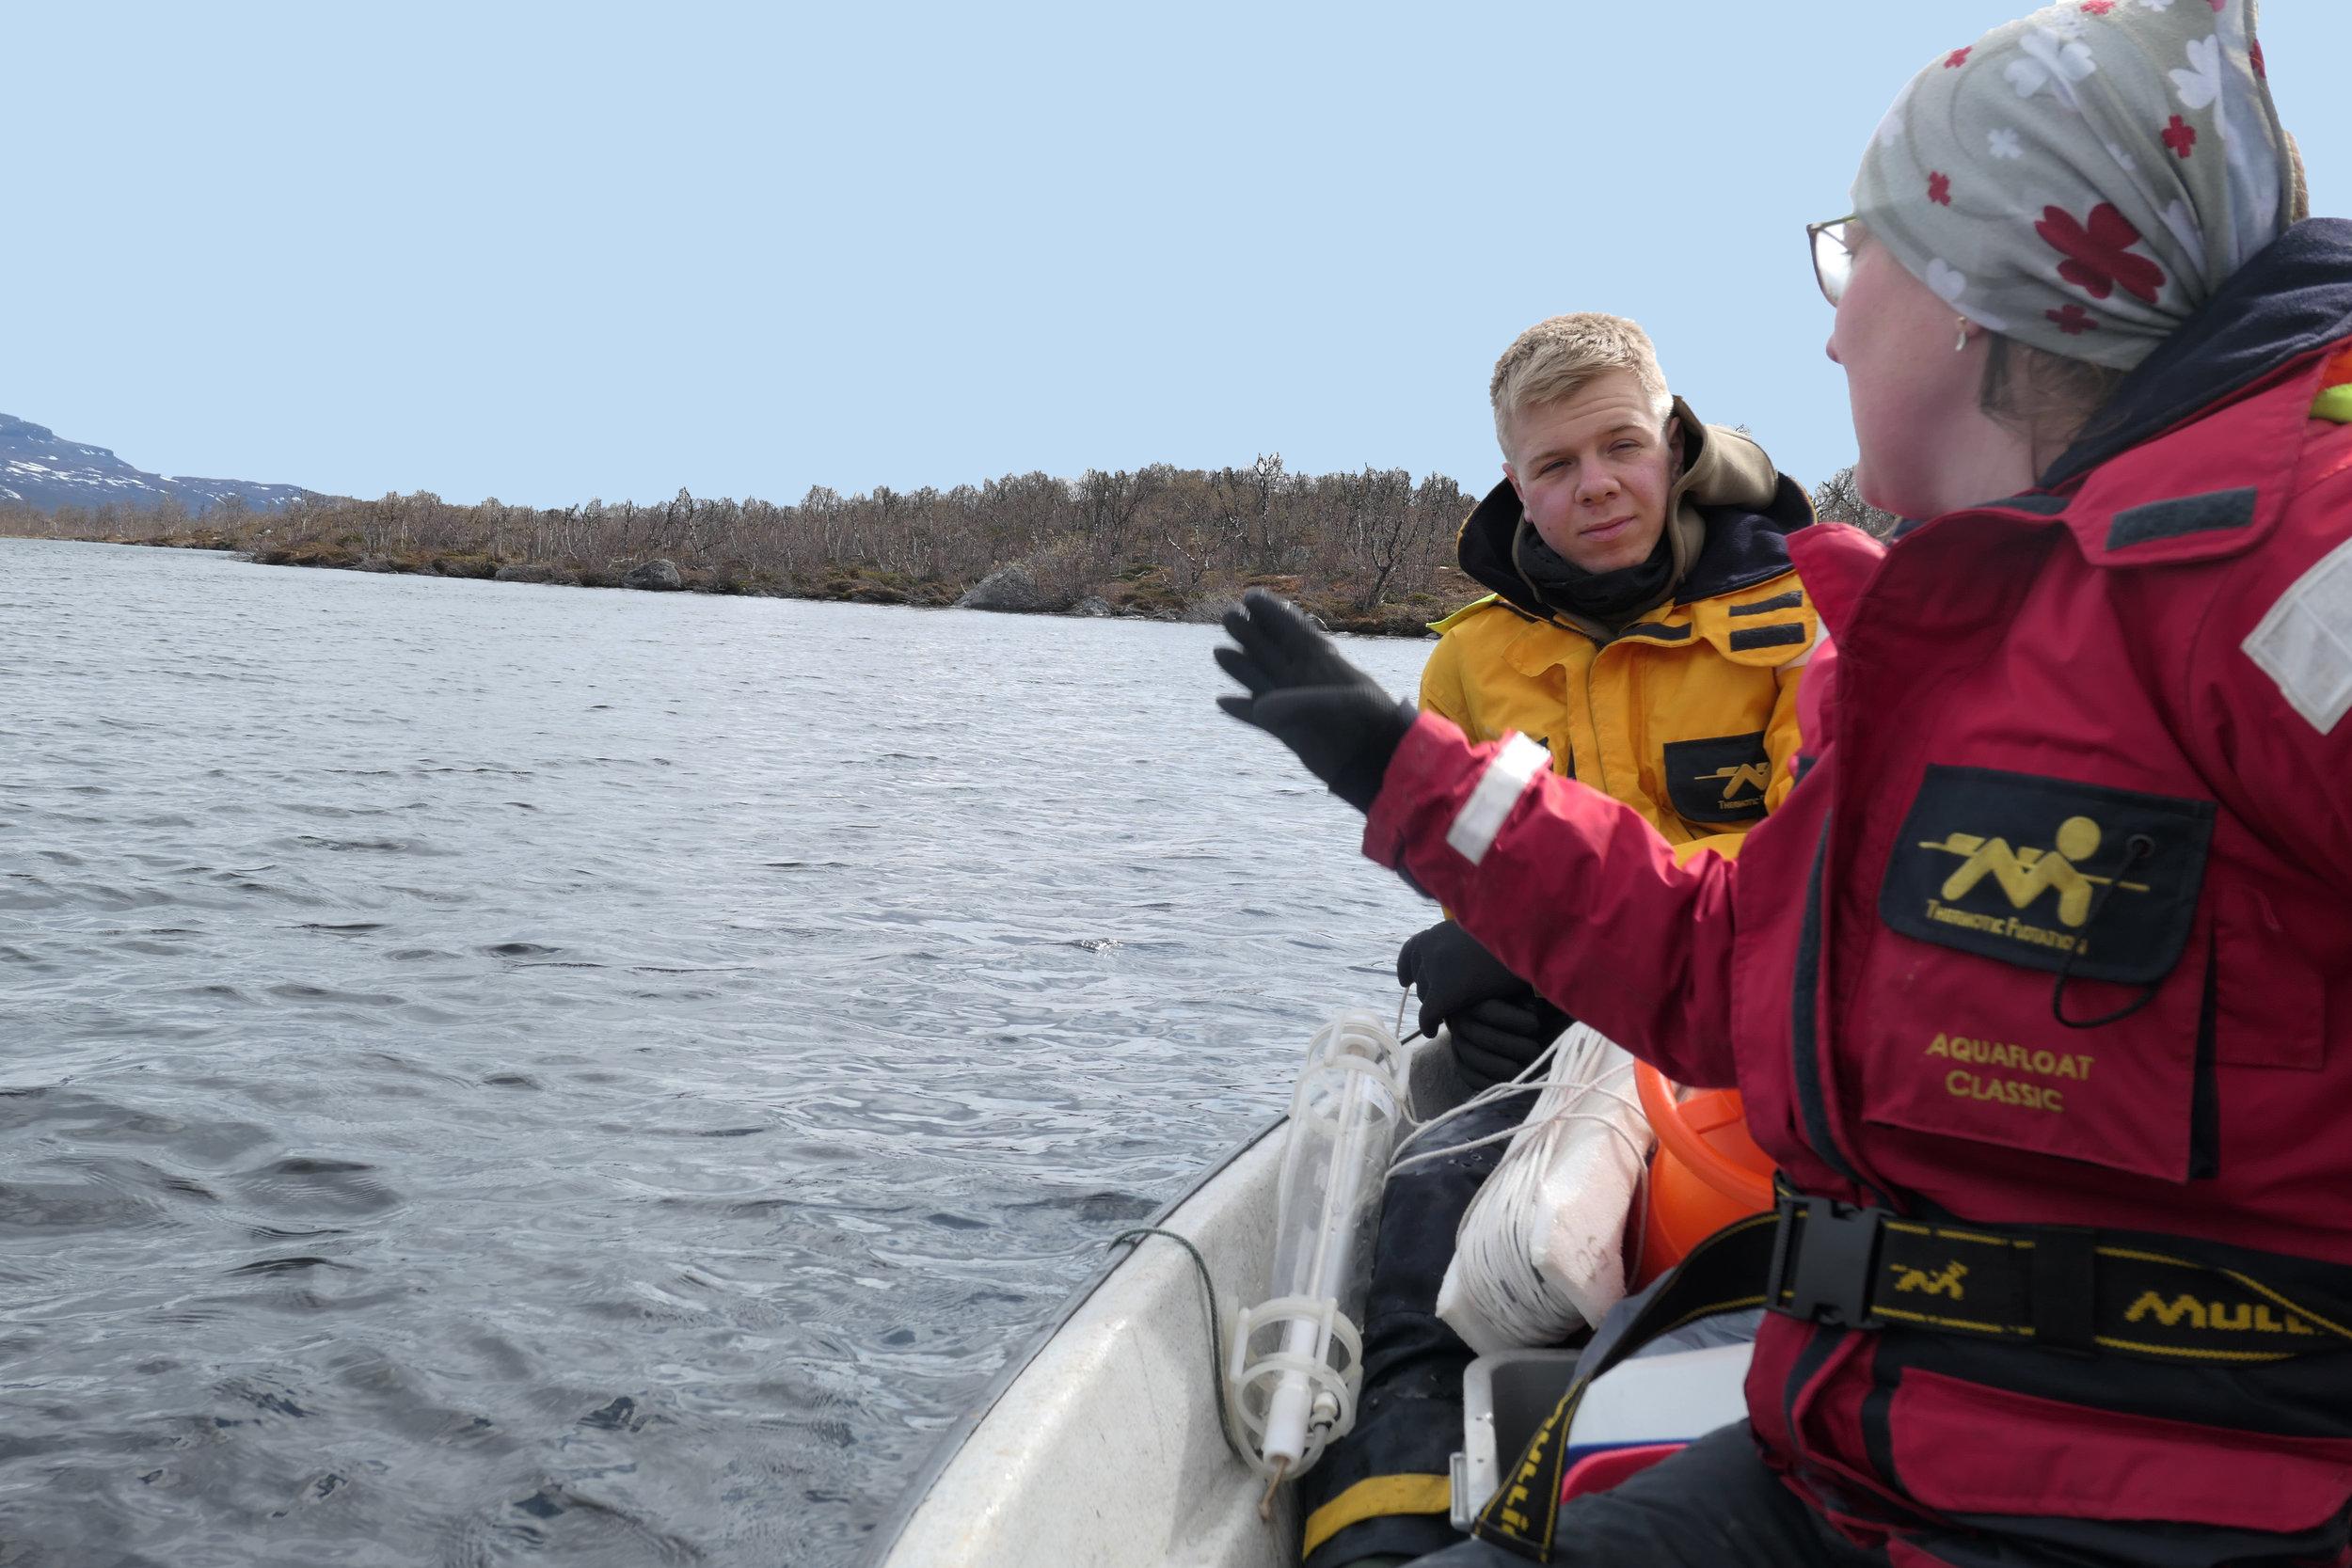 Jenny Ask Lake Almberga 03June19 Photo by Joelle.jpg